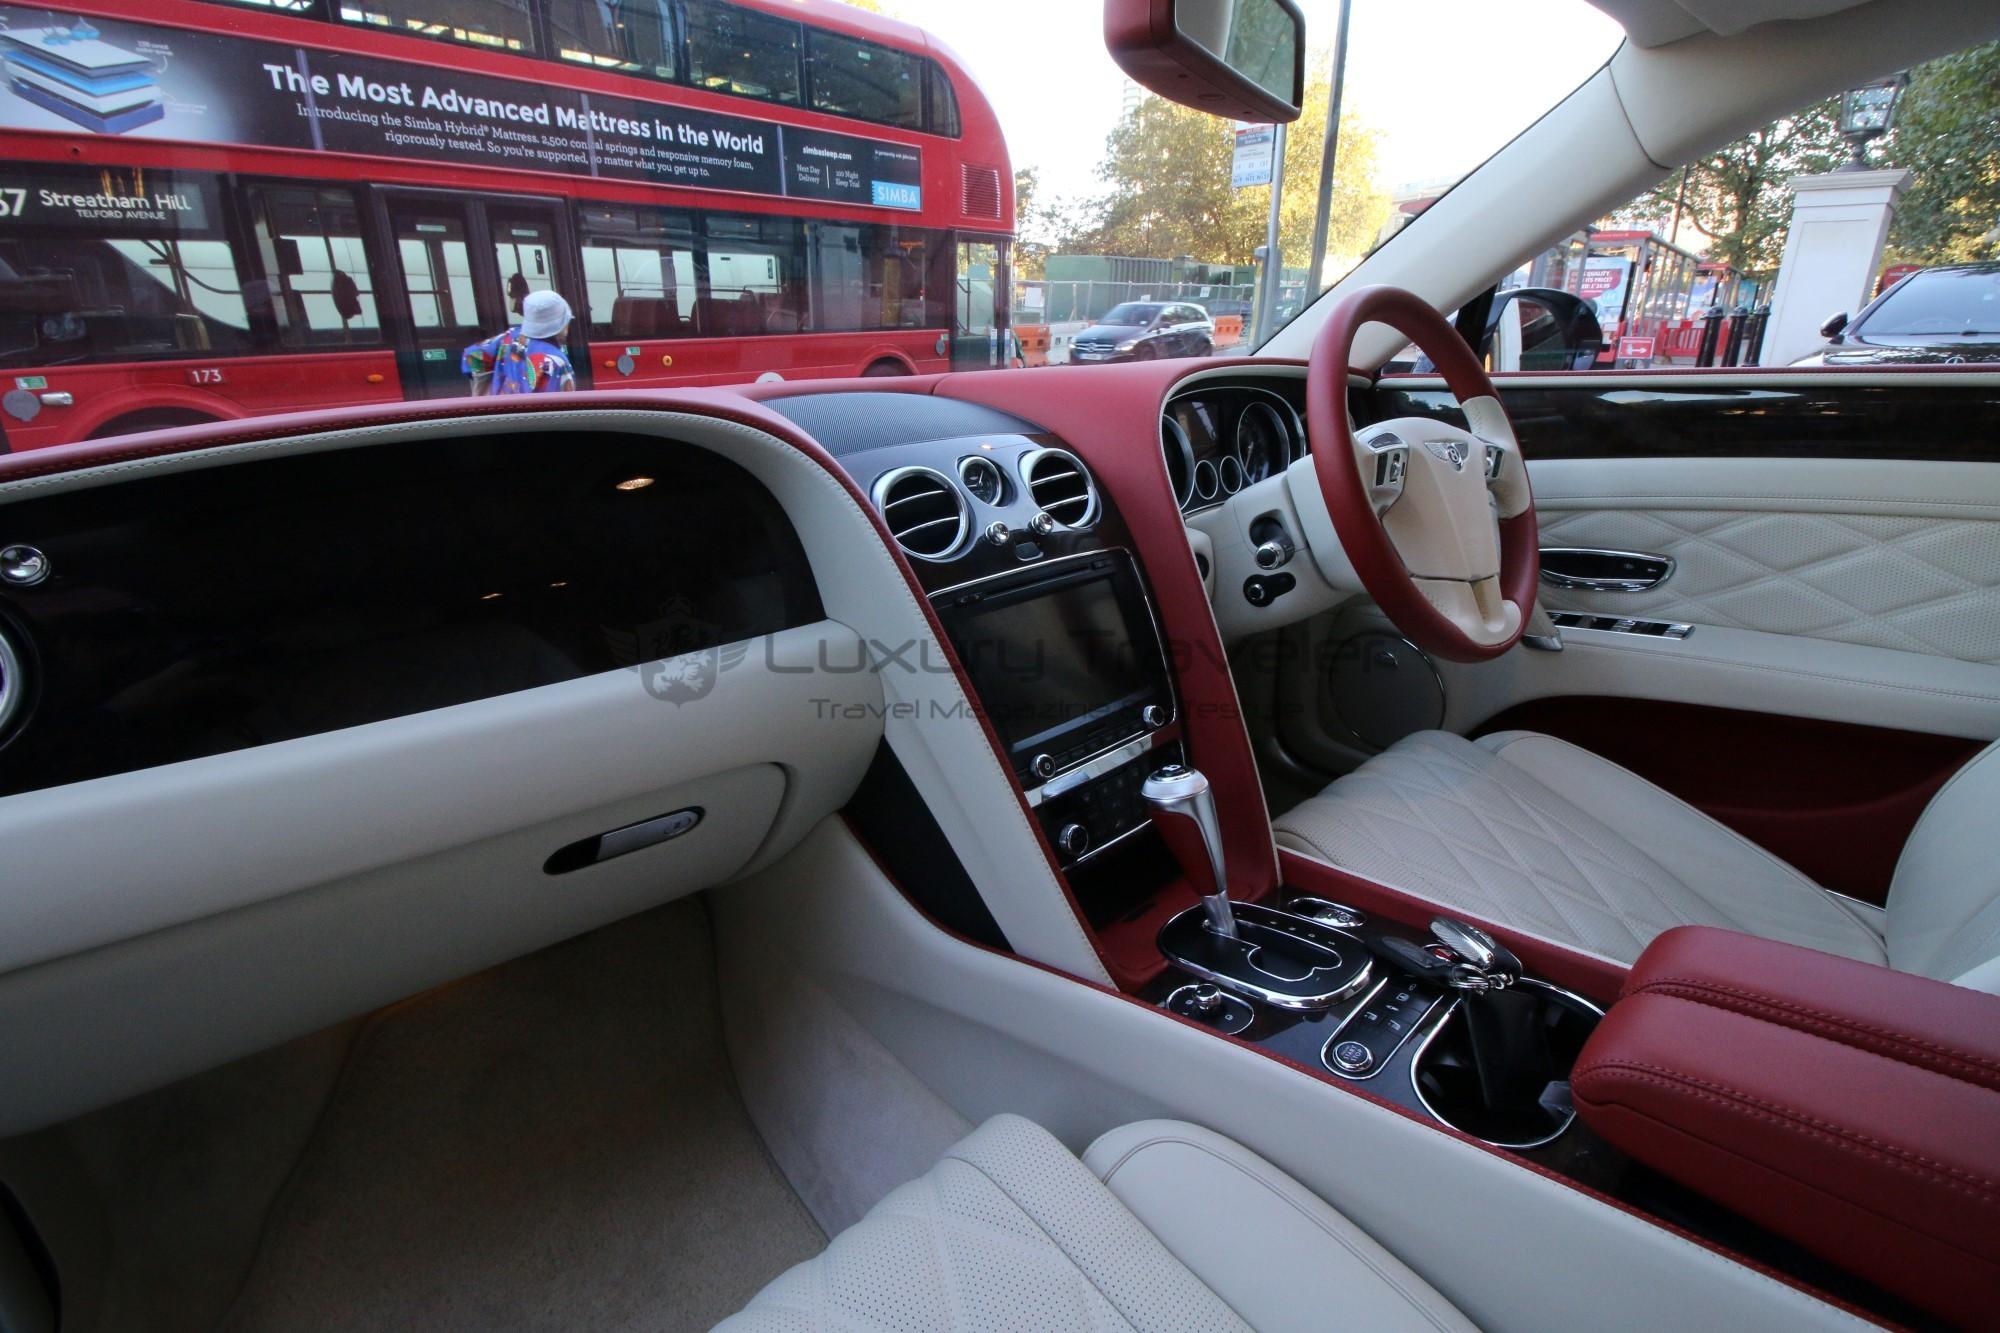 50-vip_london_driver_uk